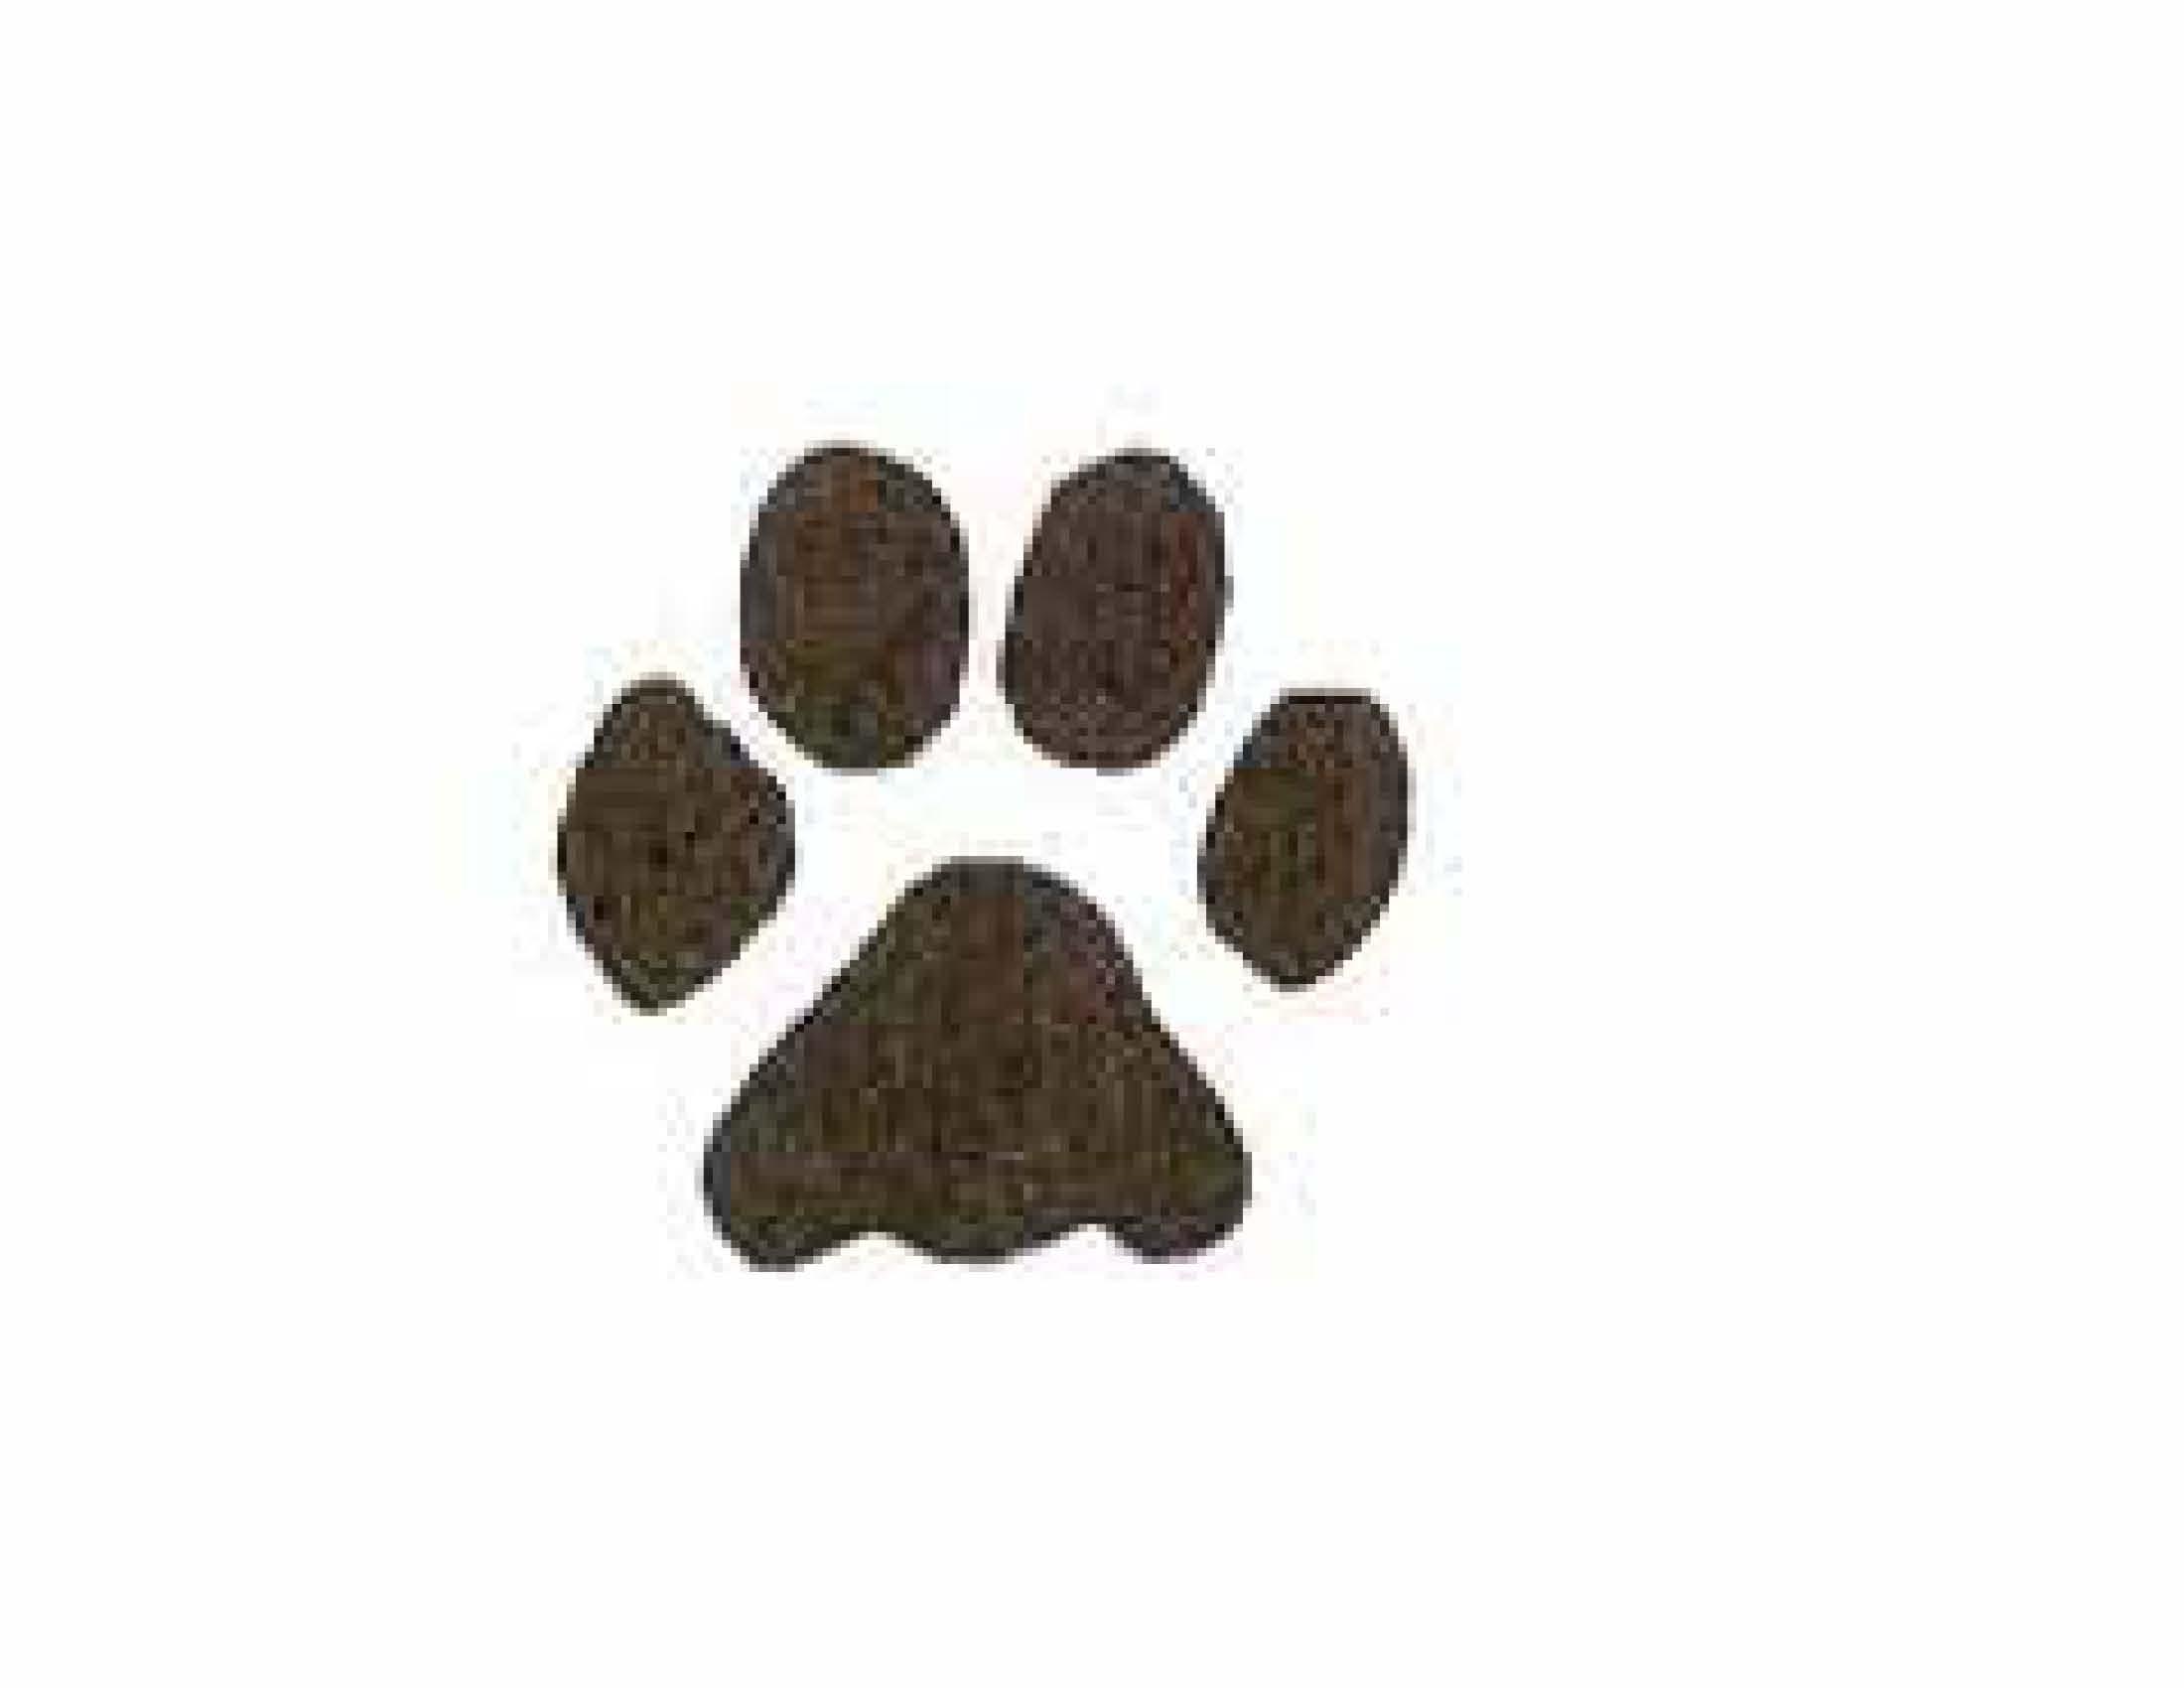 Dog paw print free download clip art on 5